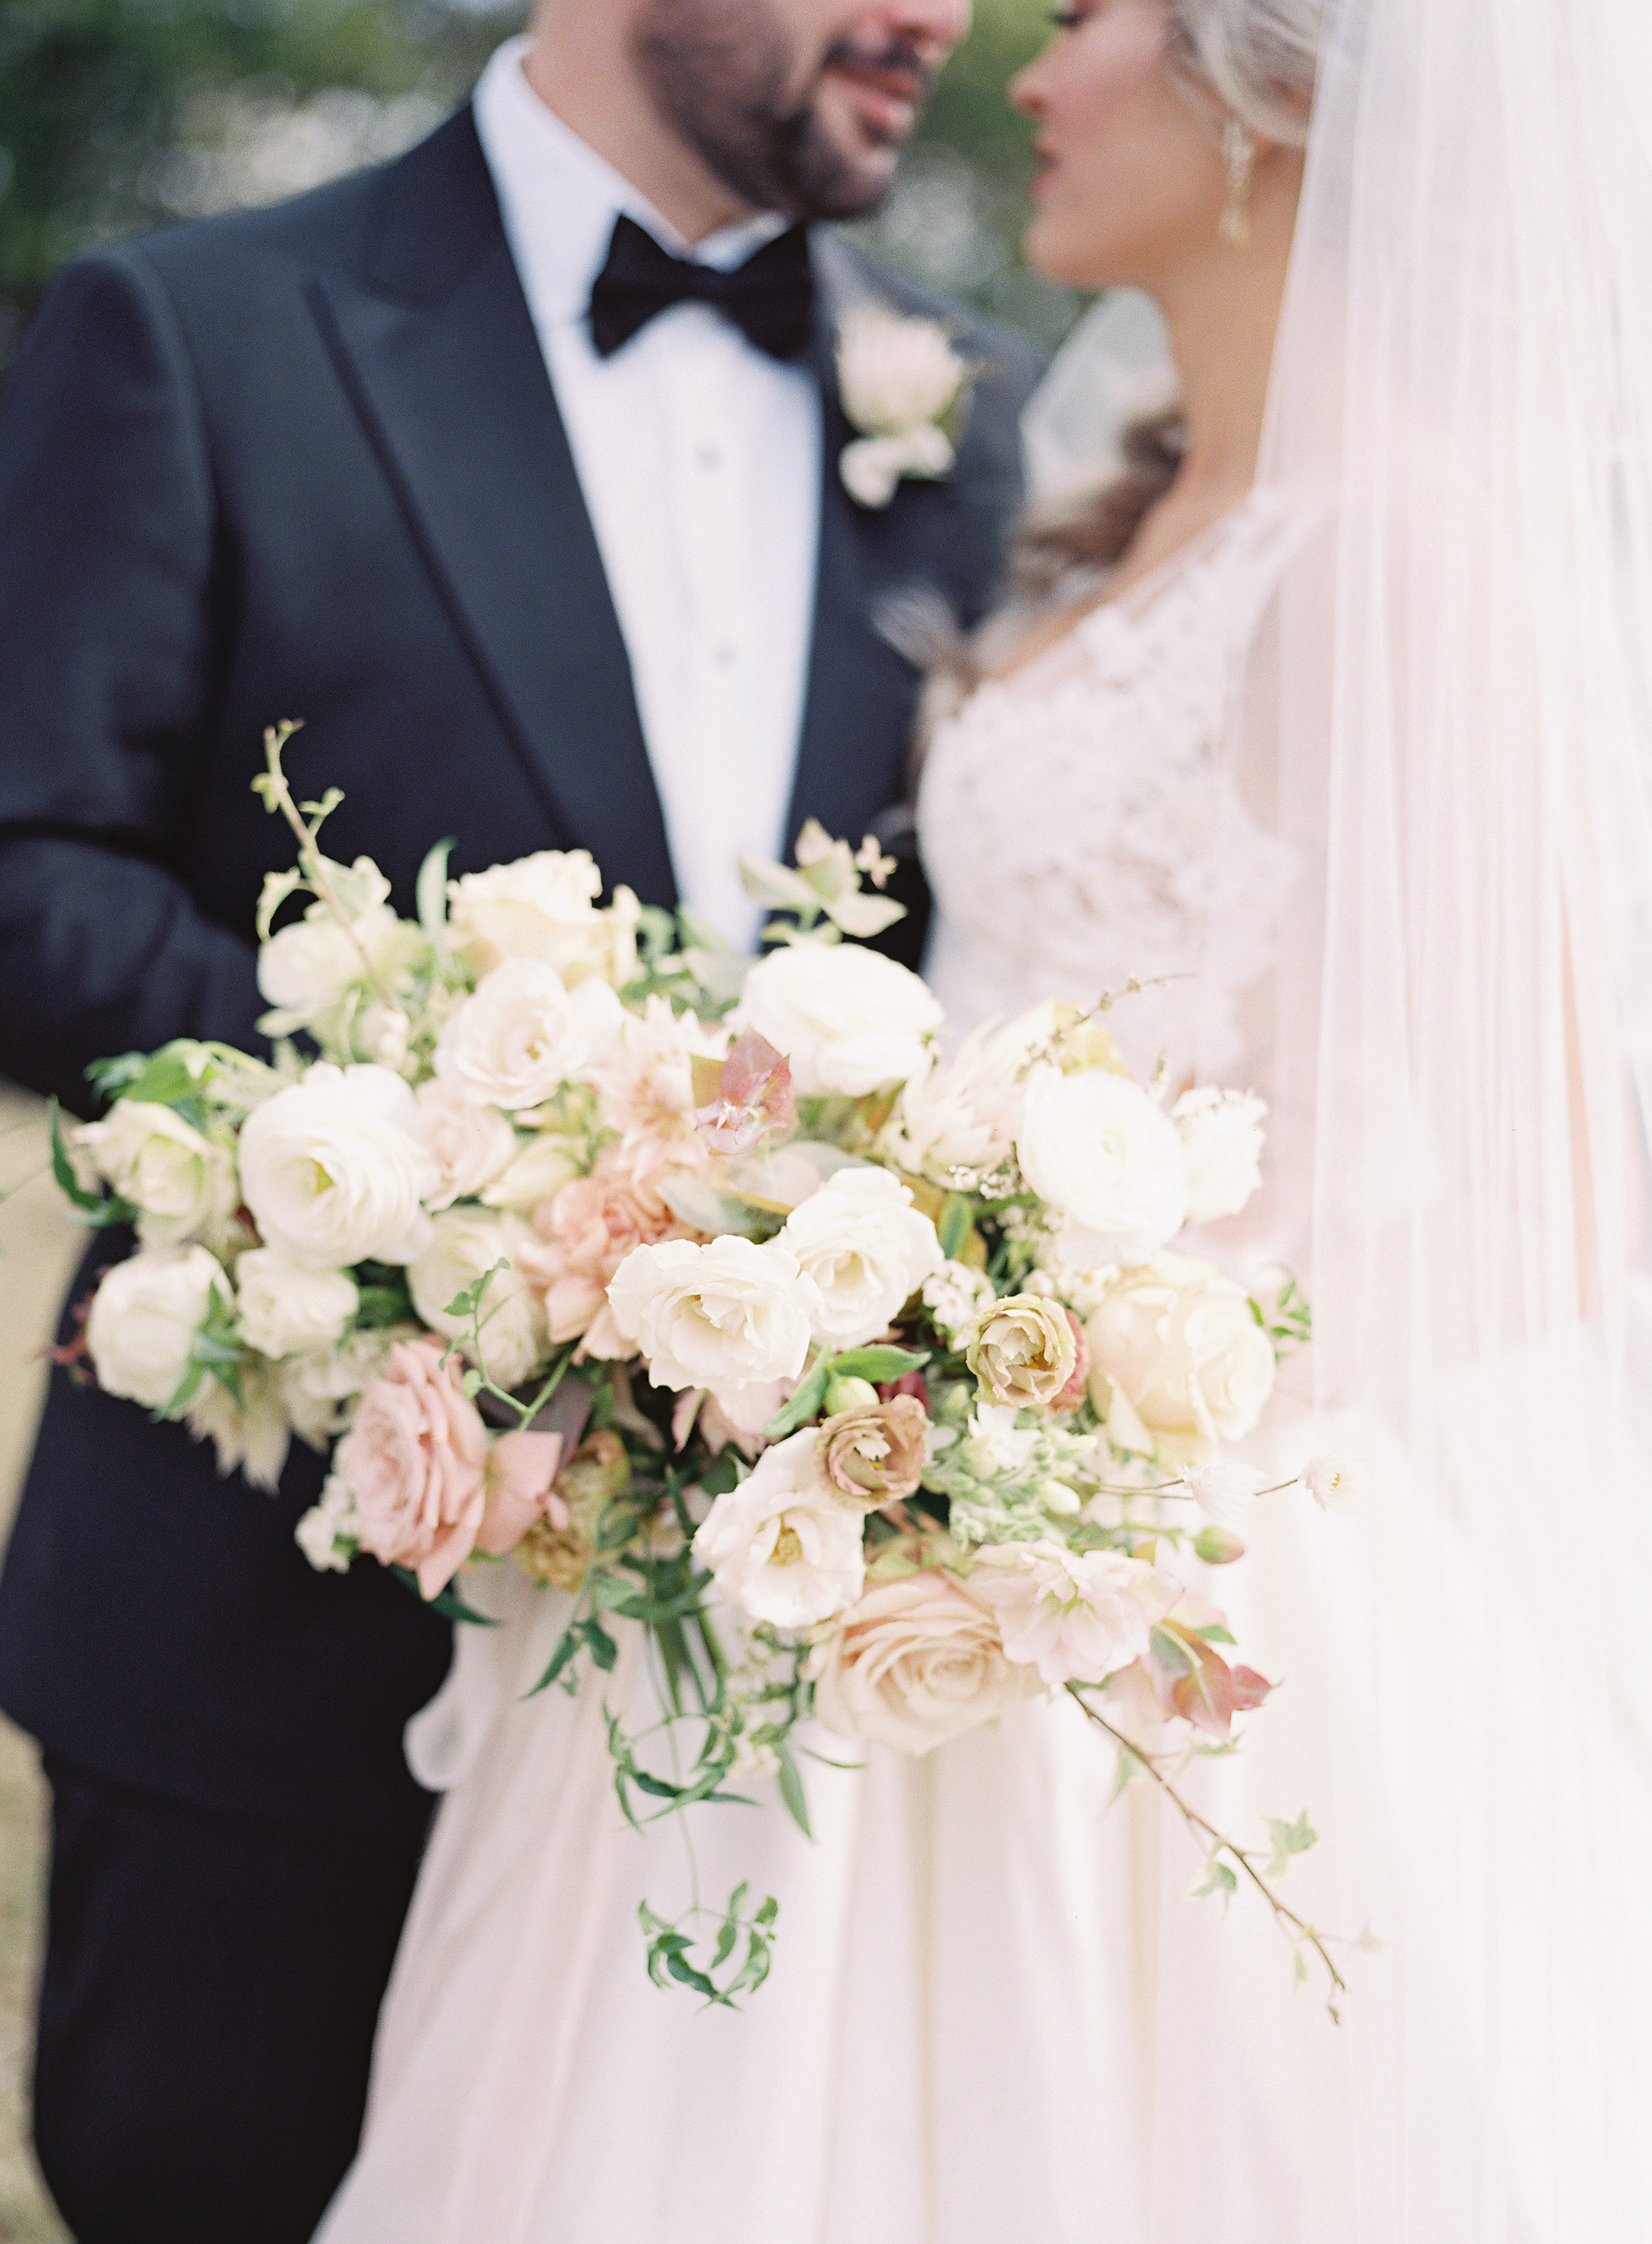 jessica-zimmerman-events-heather-payne-dan-and-shay-wedding-bouquet.jpg